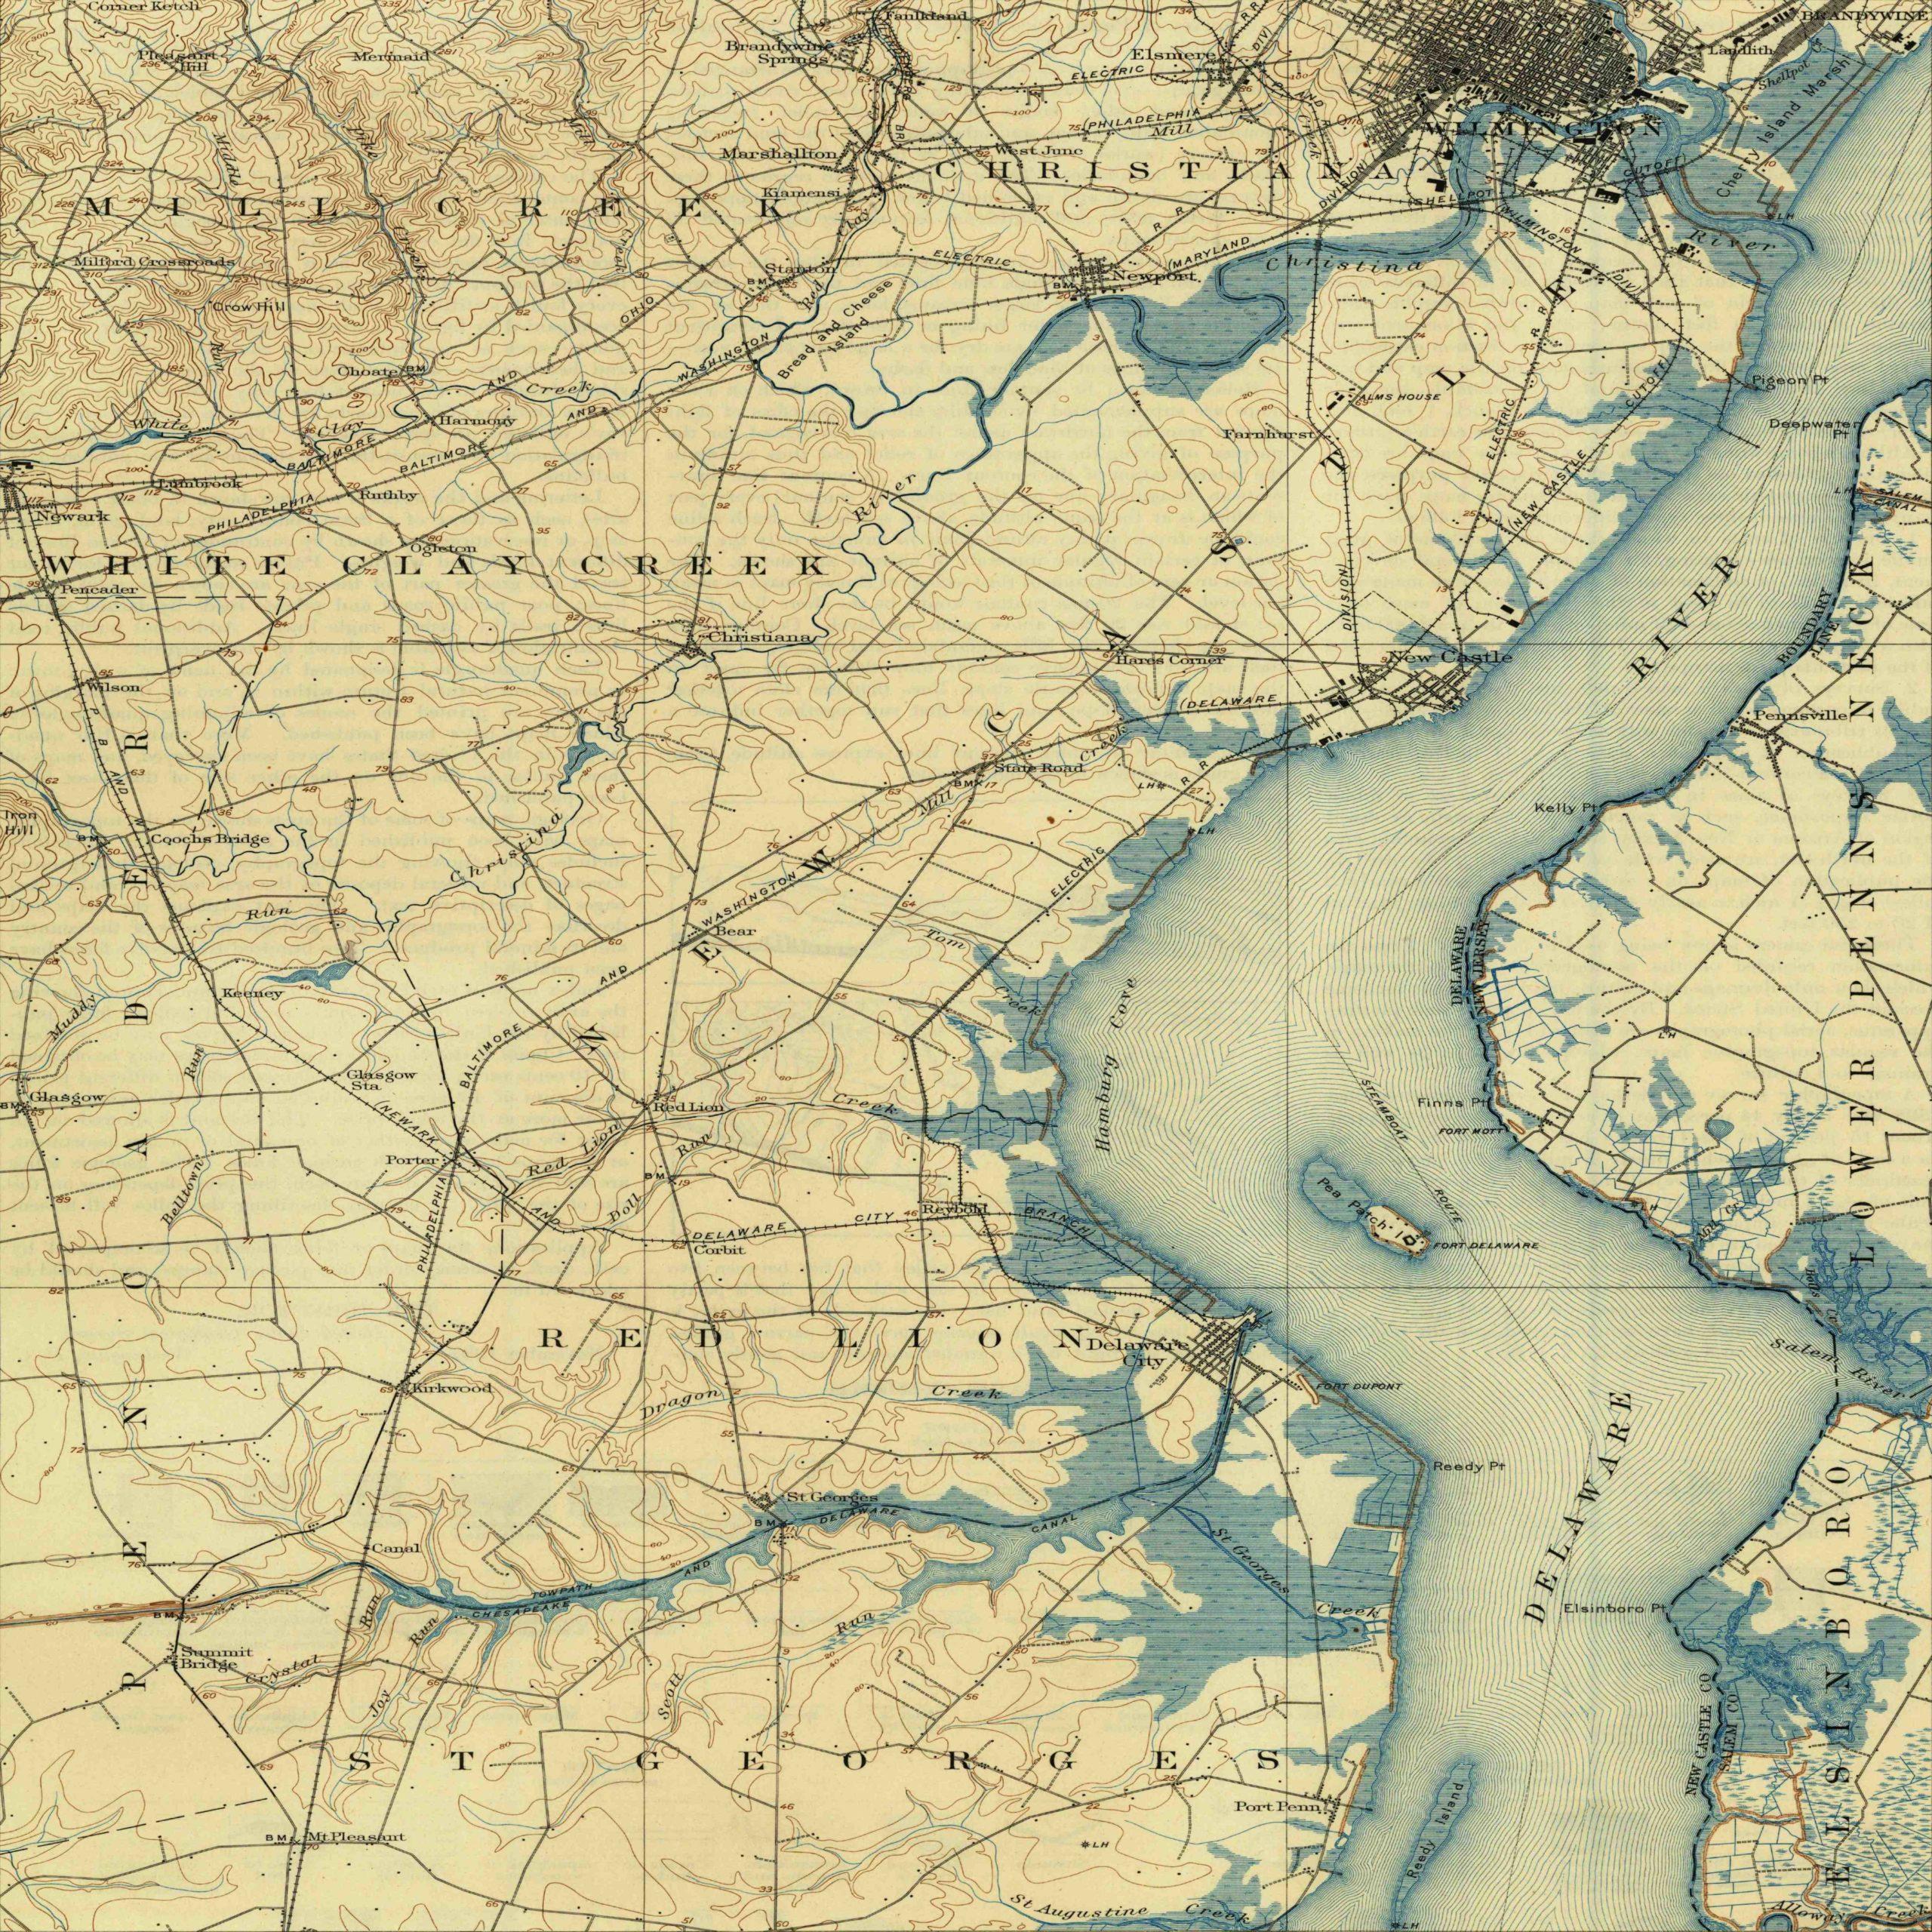 1906 Map of Wilmington, DE and the Delaware river estuary